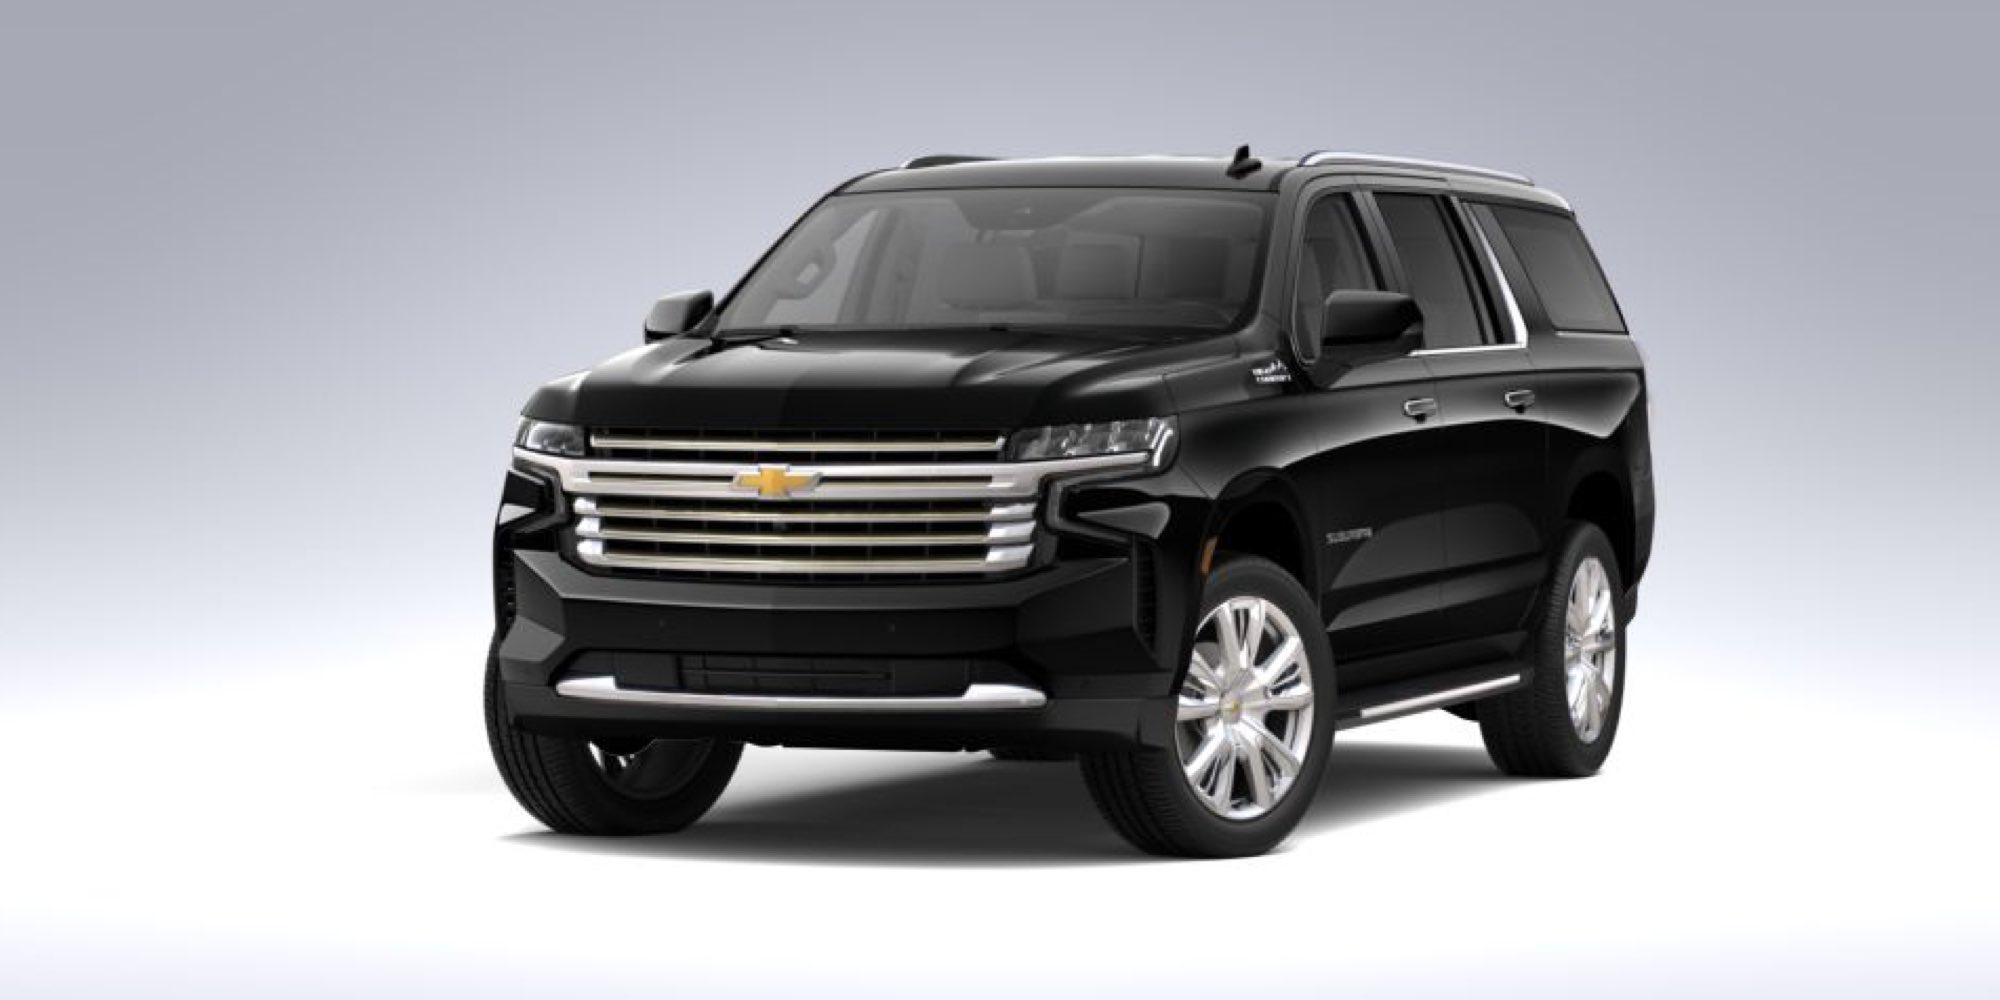 2021 Chevy Suburban in Black